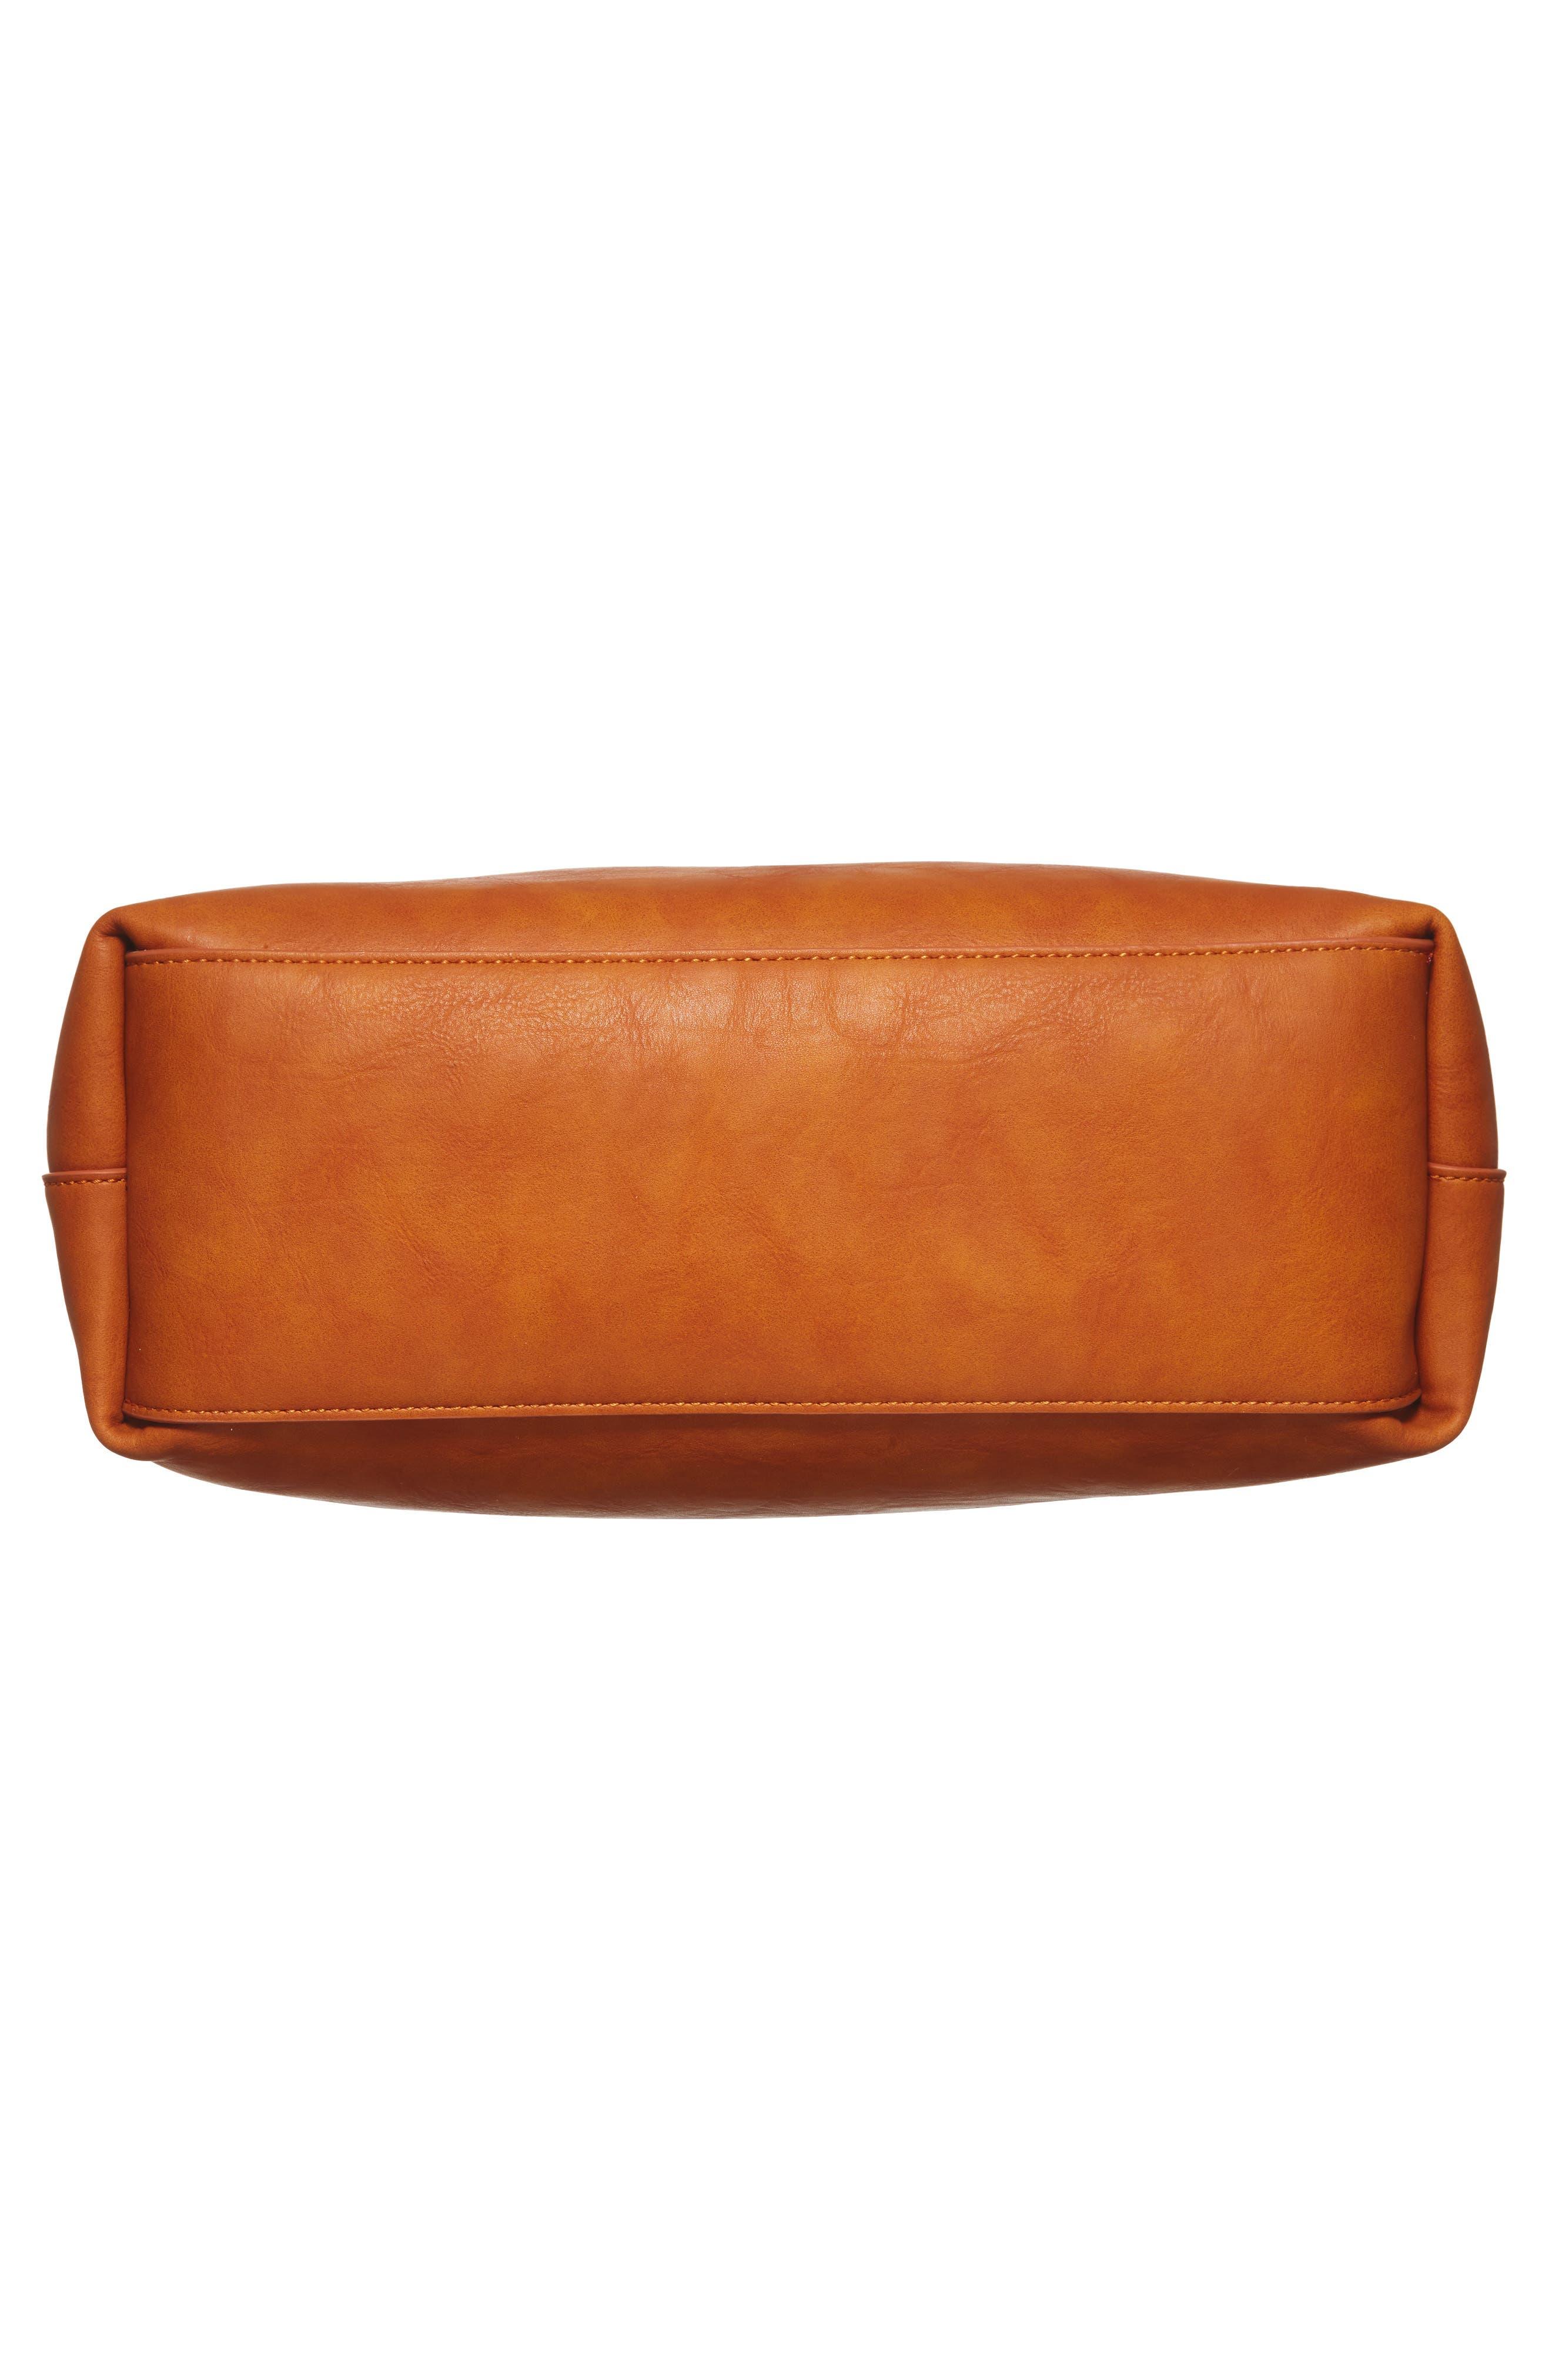 Oversize Melyssa Faux Leather Tote,                             Alternate thumbnail 6, color,                             200